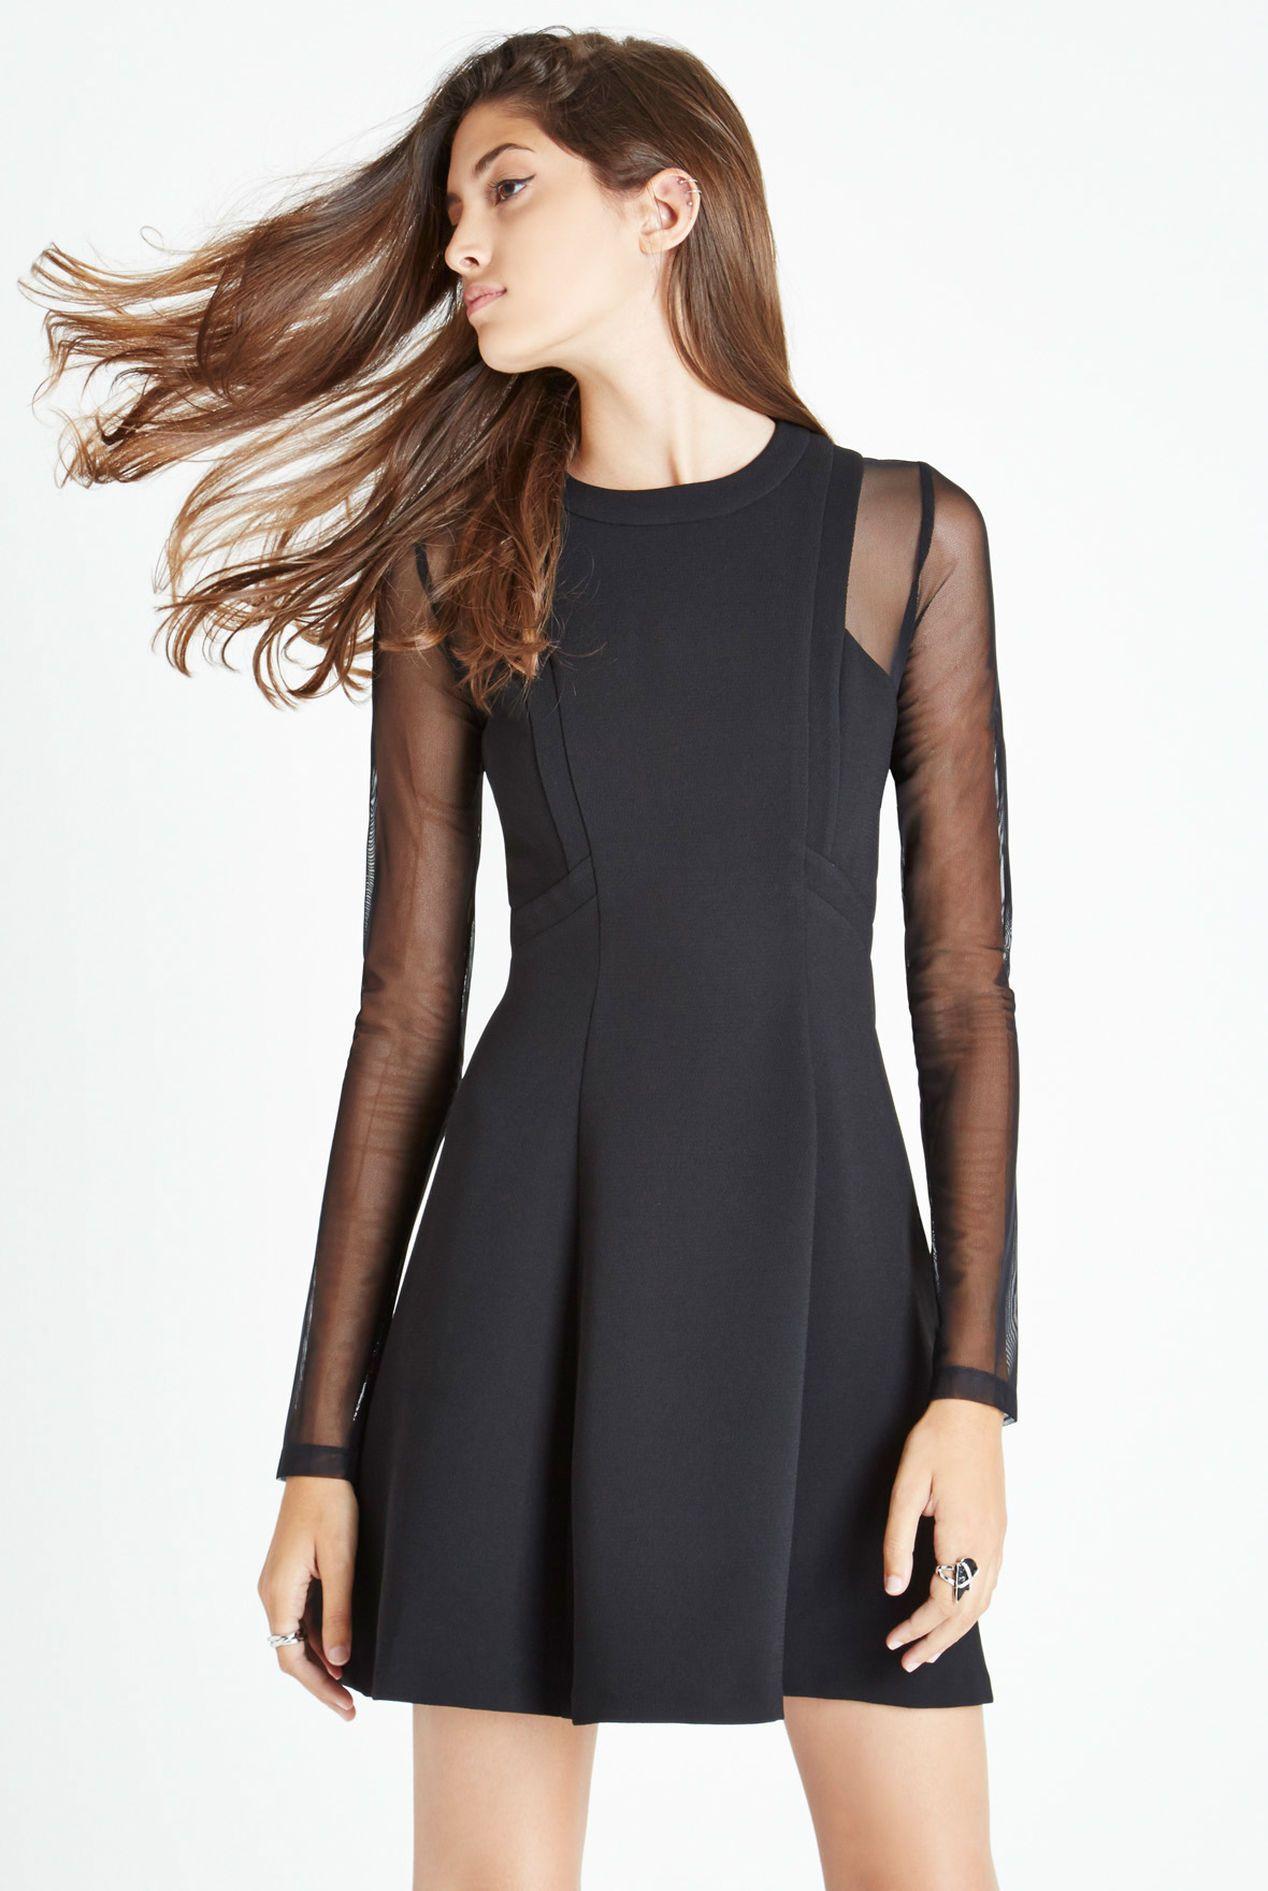 Long Sheer Sleeves Dress With Bands Sheer Sleeve Dress Long Sleeve Mesh Dress Night Out Dress [ 1891 x 1268 Pixel ]